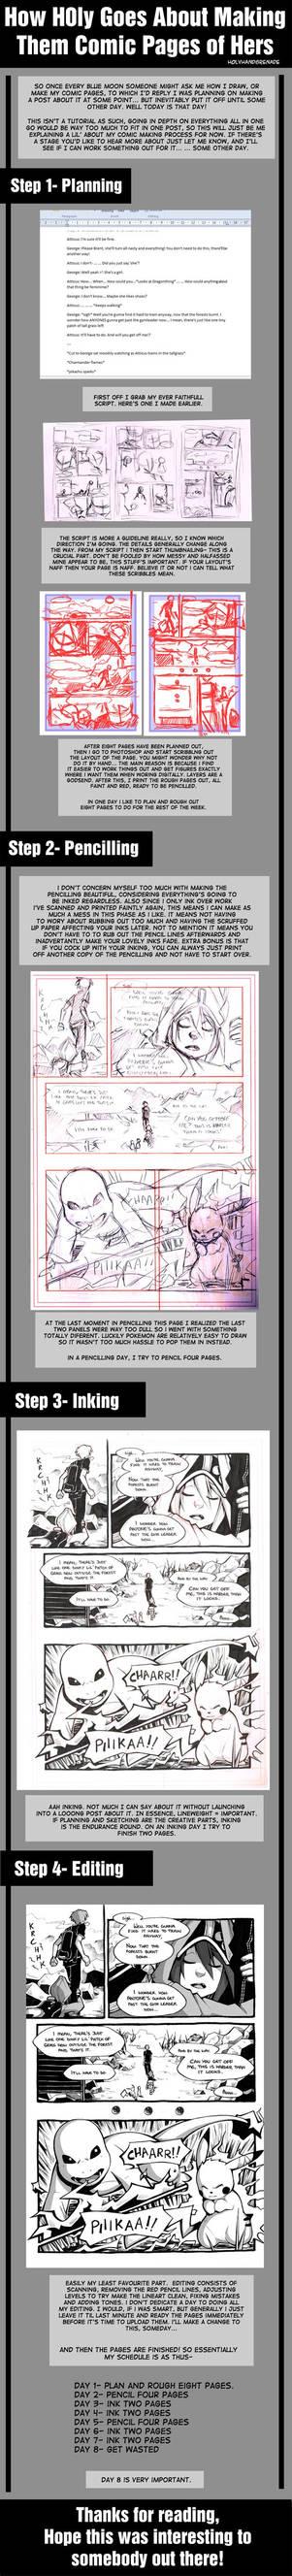 H0ly's Comic Making Process